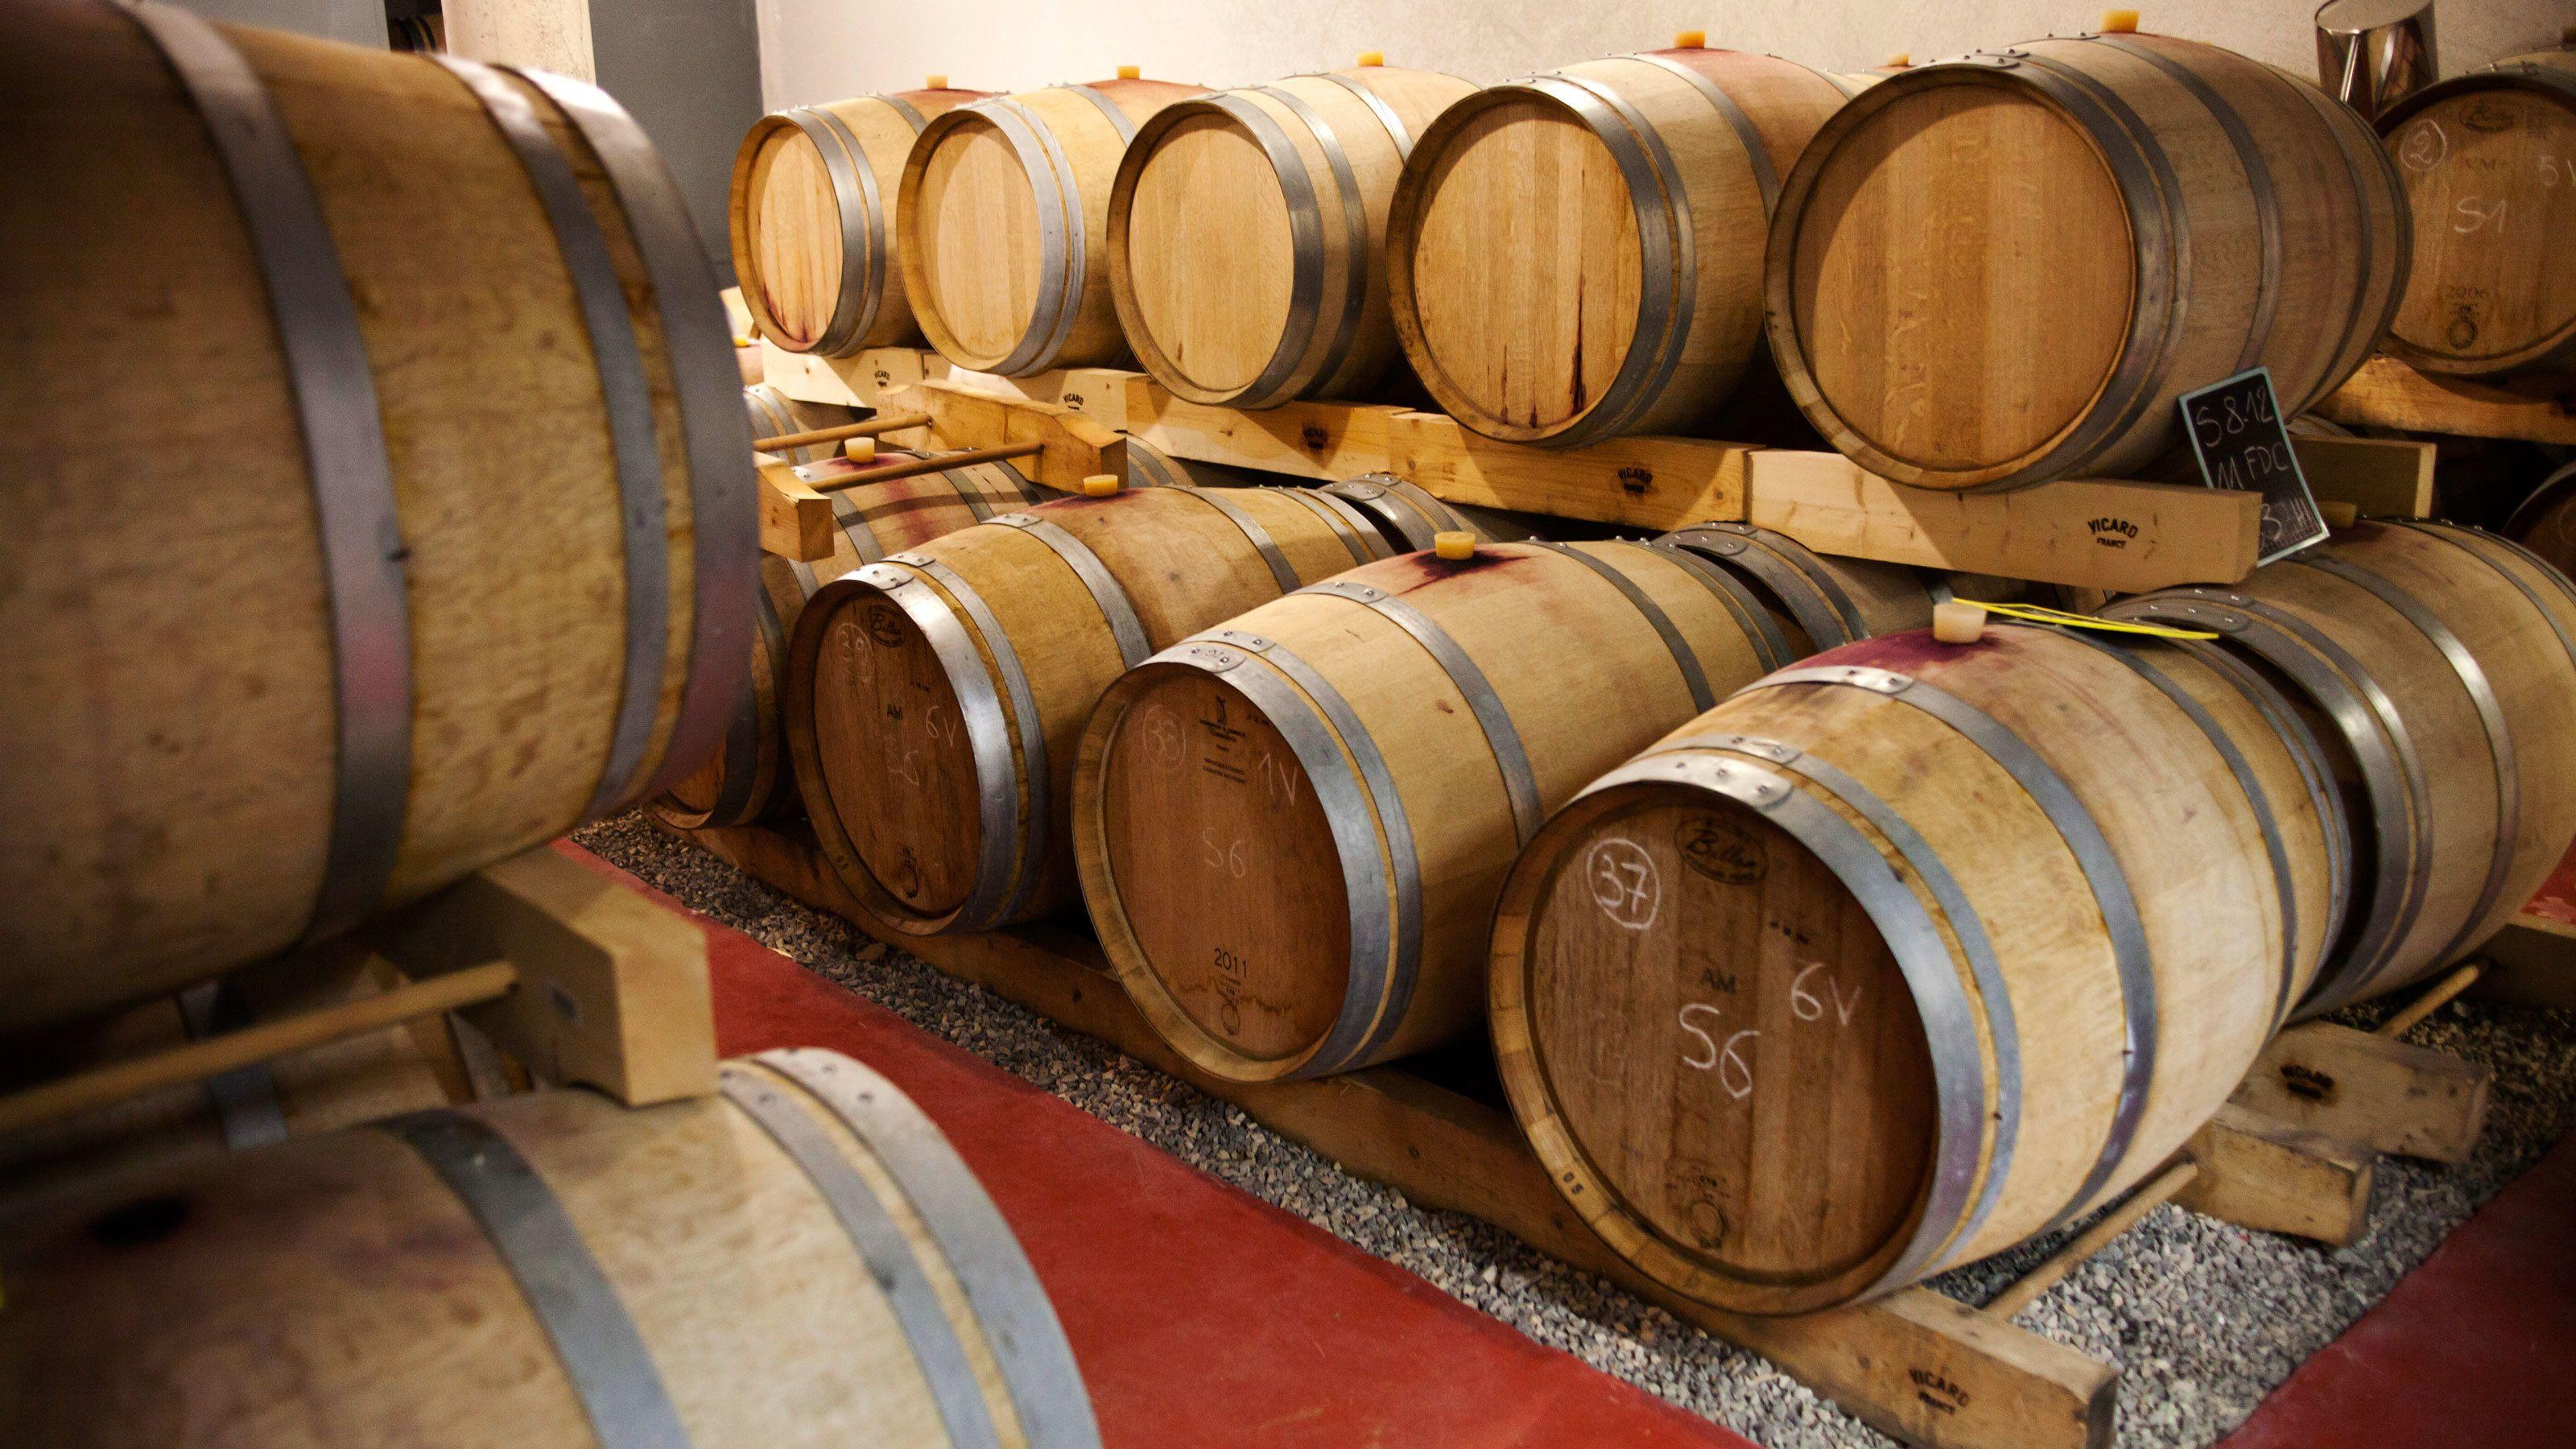 wine barrels in cellar at Coteaux d'Aix Marseille